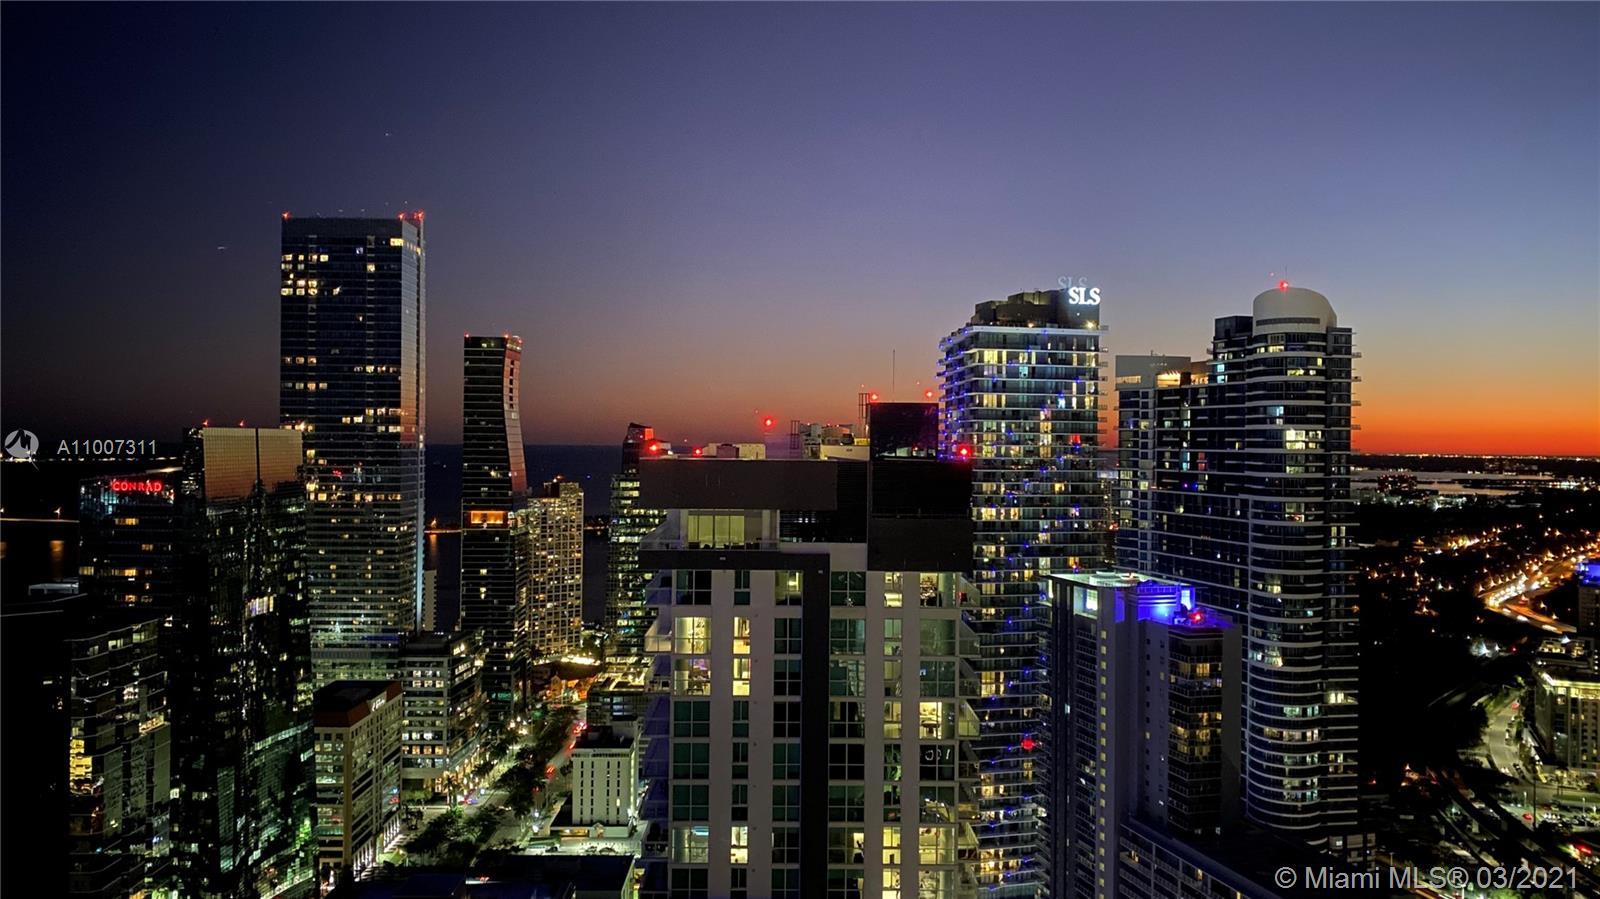 1010 Brickell #4806 - 1010 Brickell Ave #4806, Miami, FL 33131